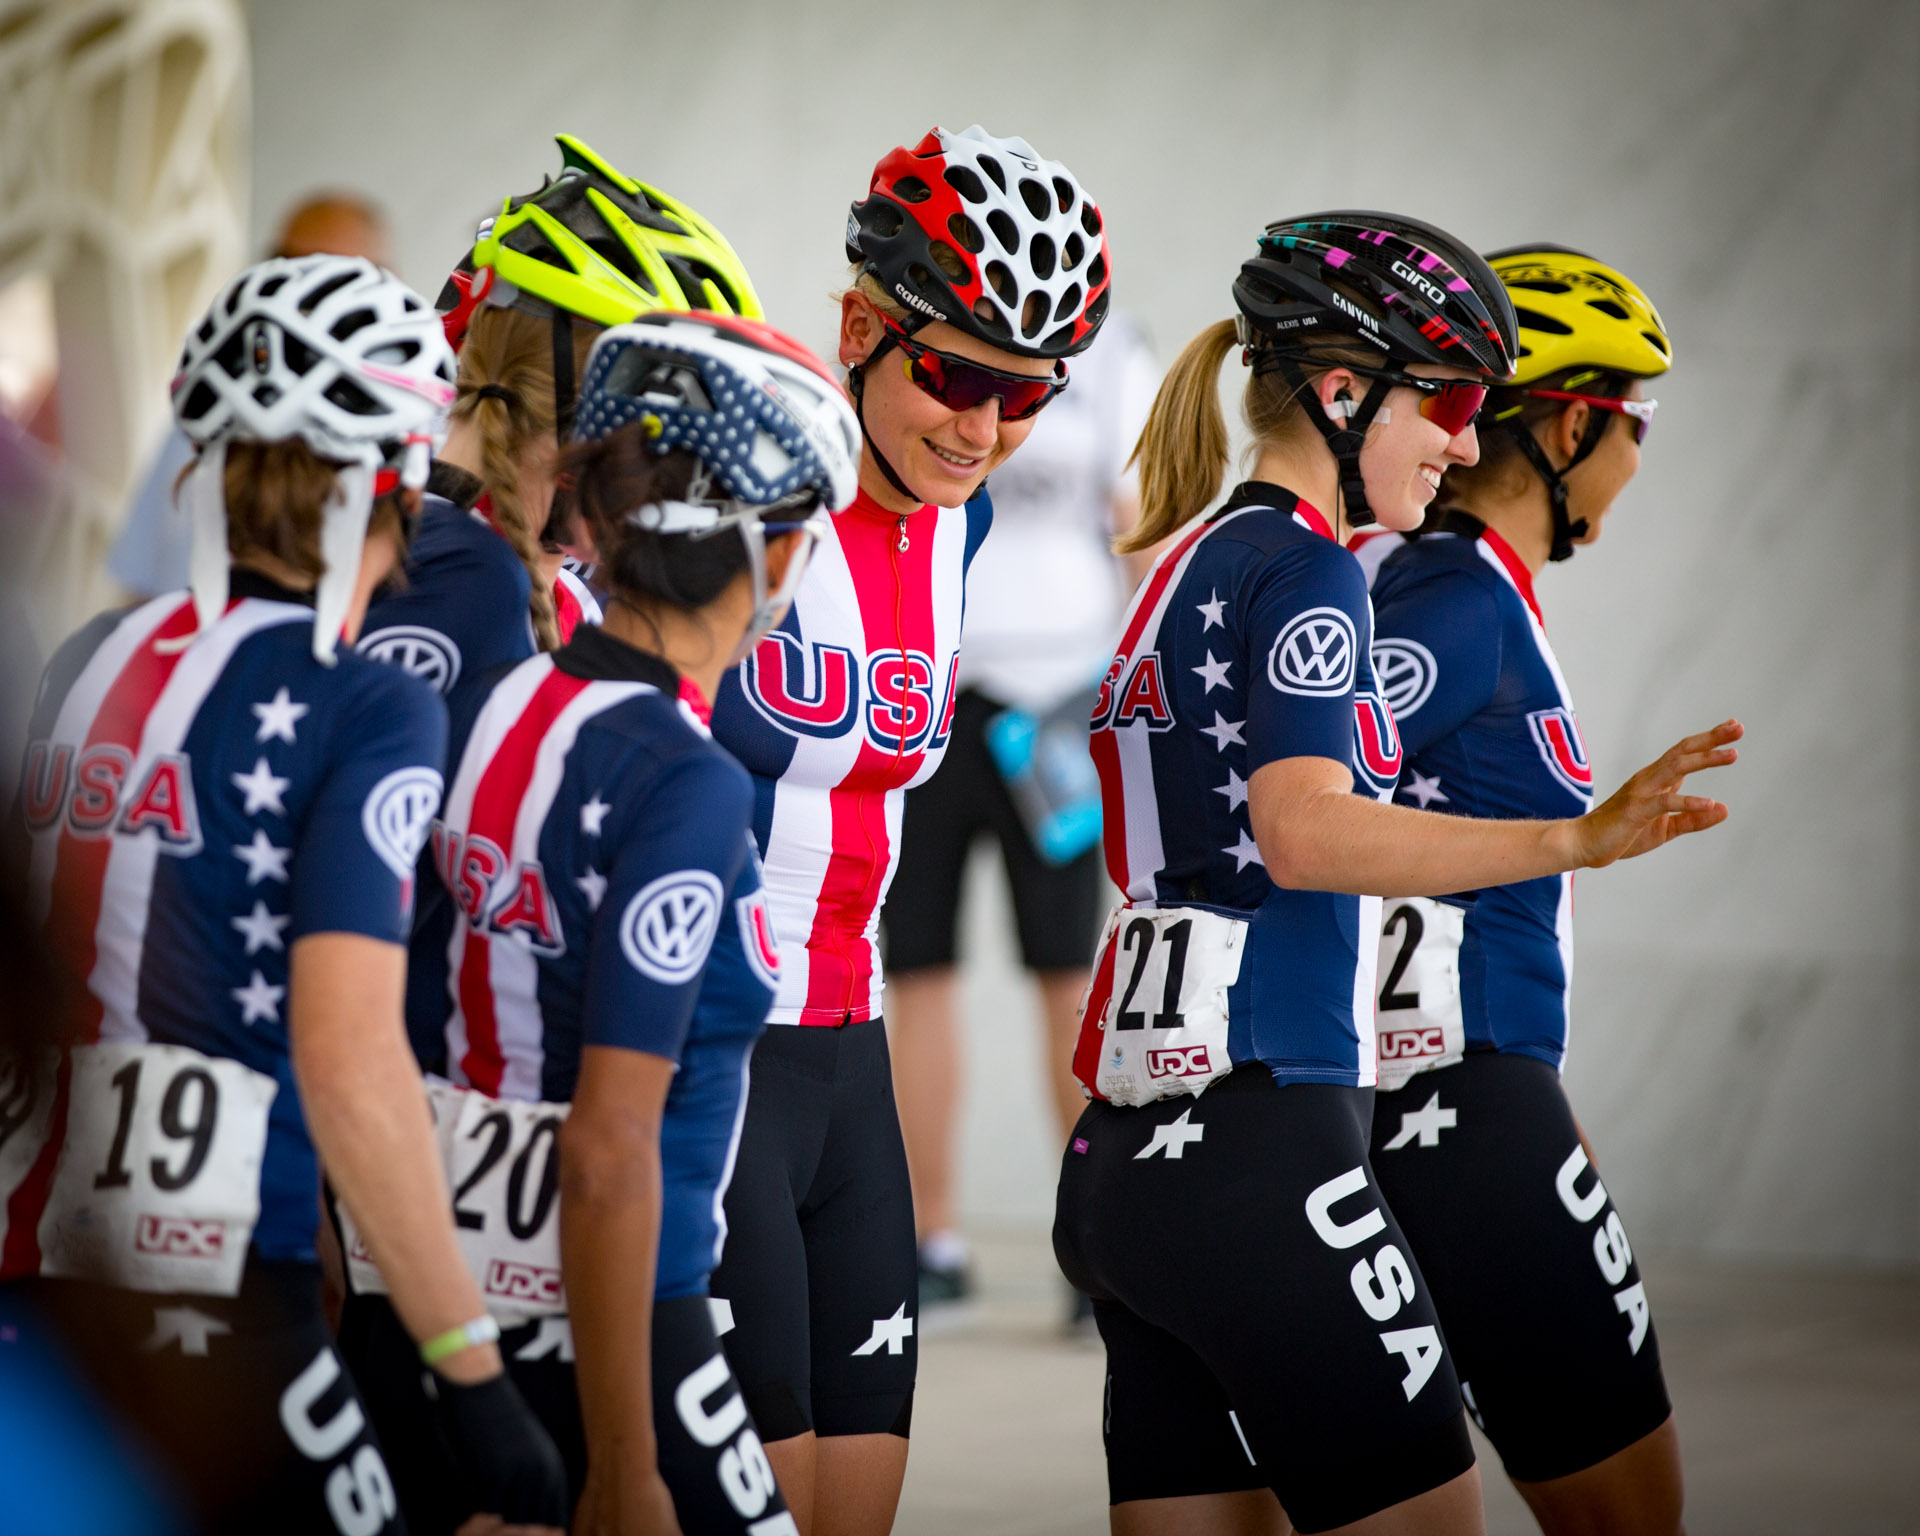 UCI Road World Championships Women's Road Race